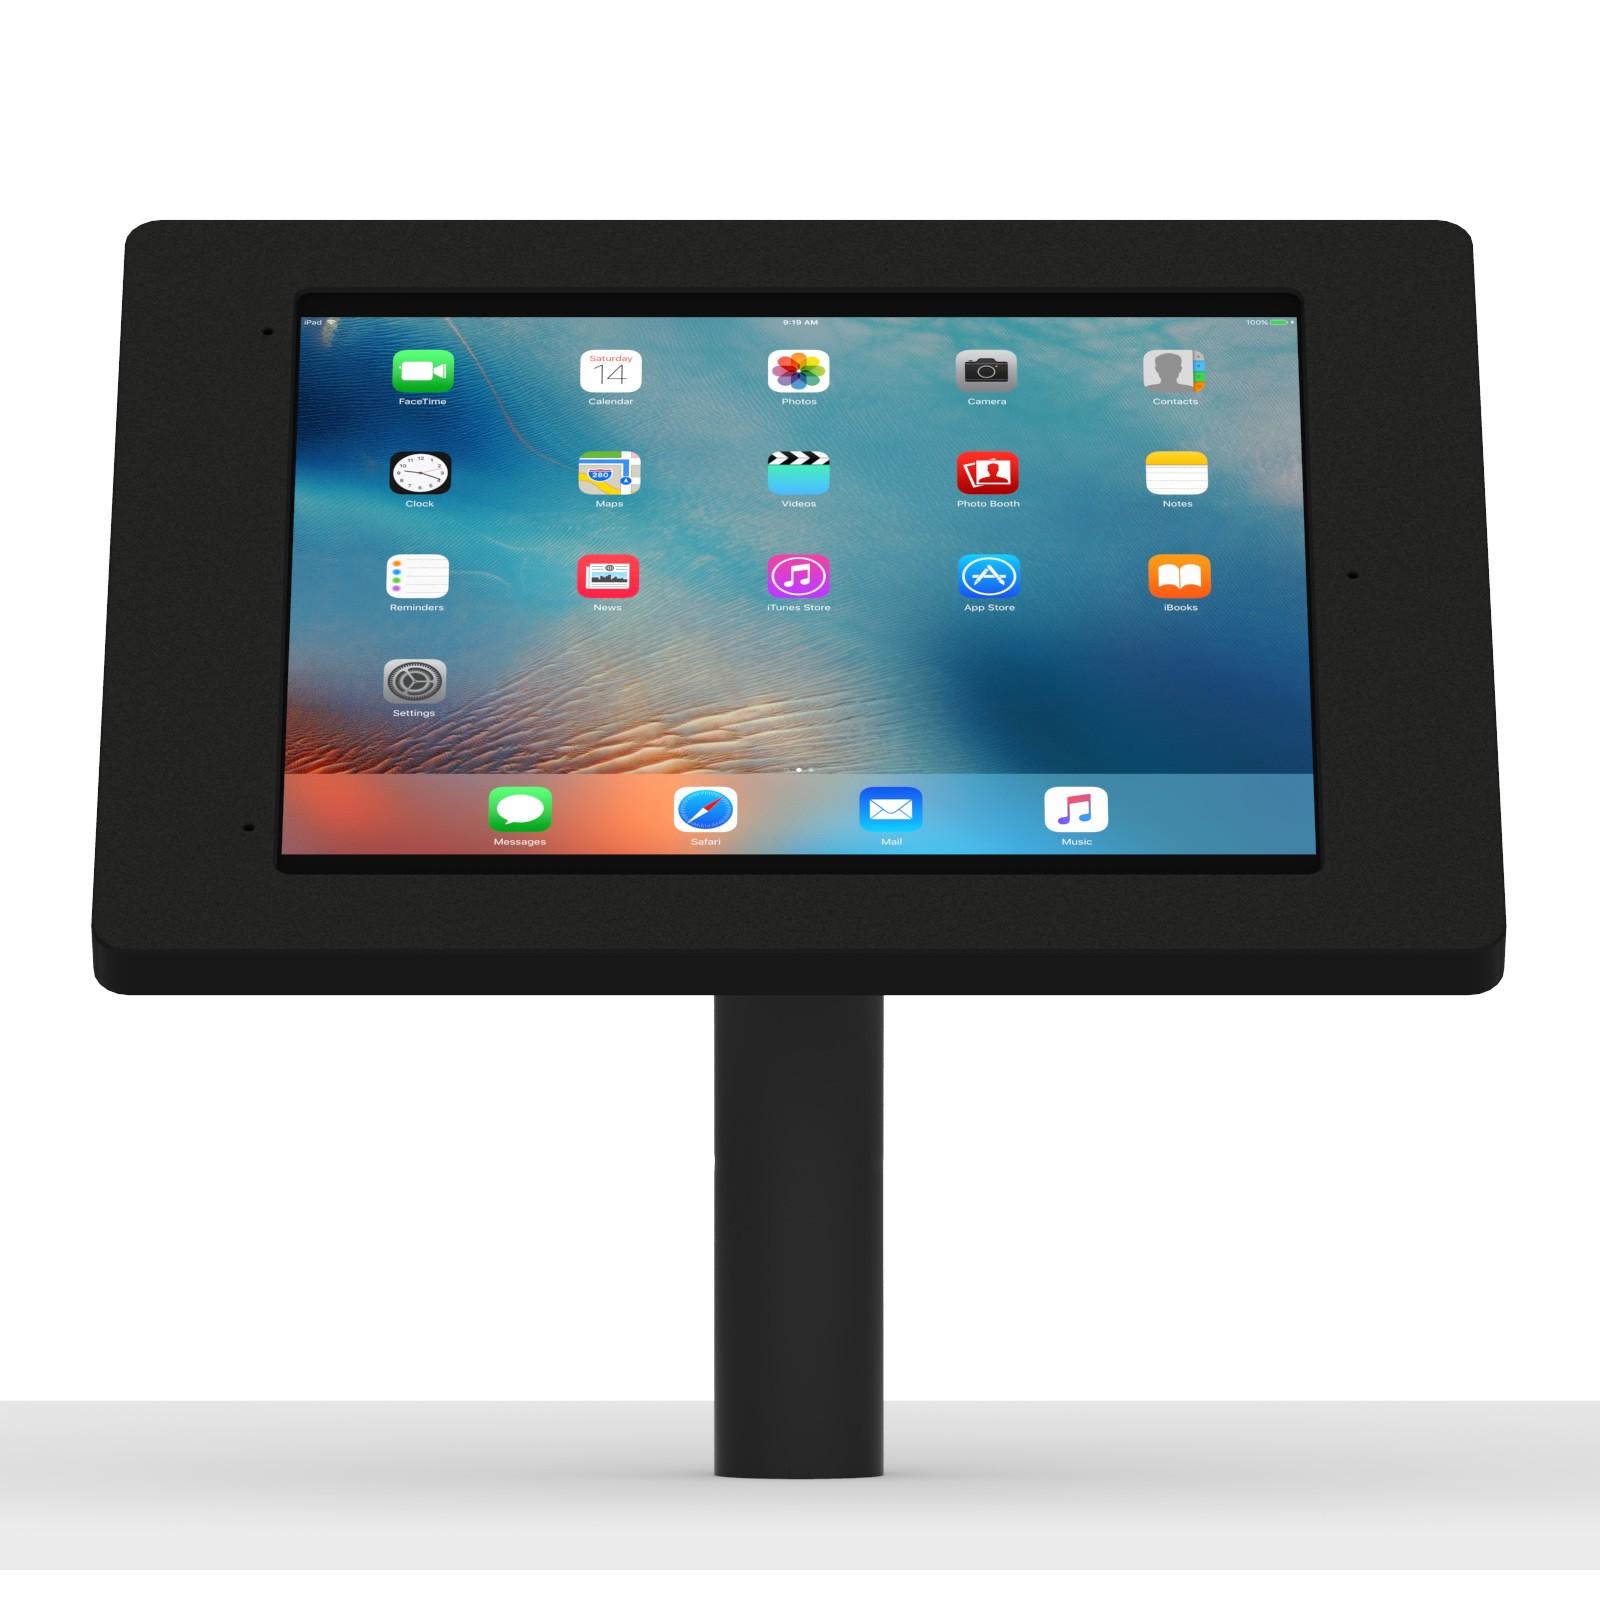 12 9 Inch Ipad Pro Home Button Covered Black Enclosure W